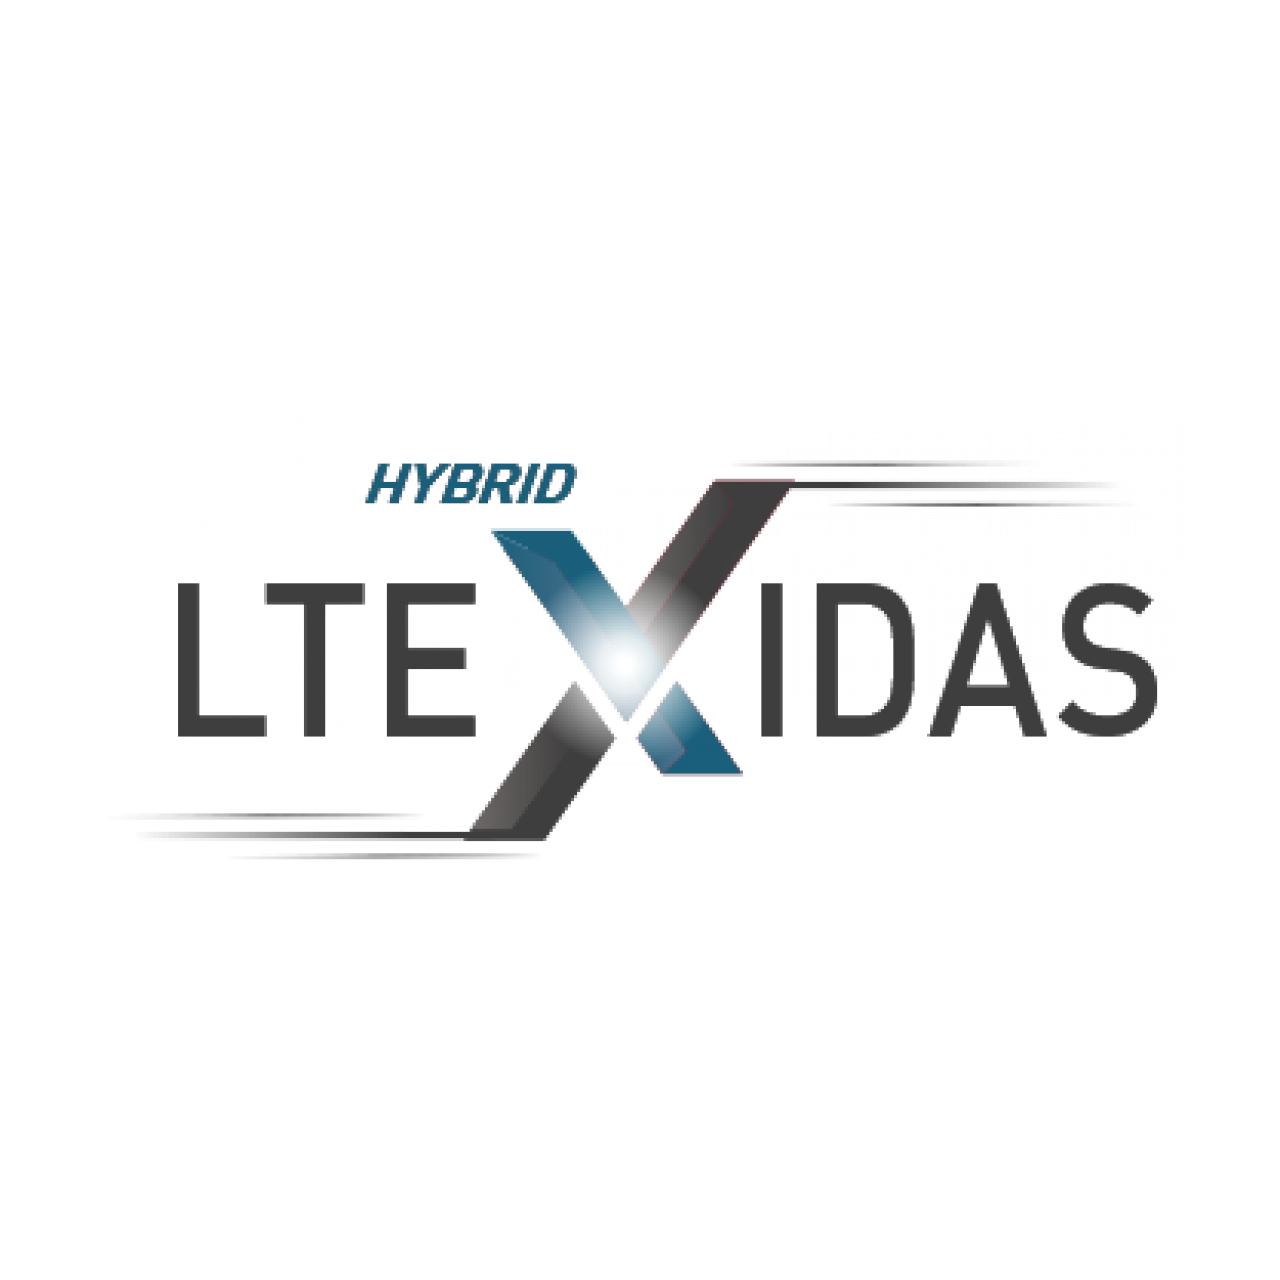 Logo Hybrid LTE IDAS